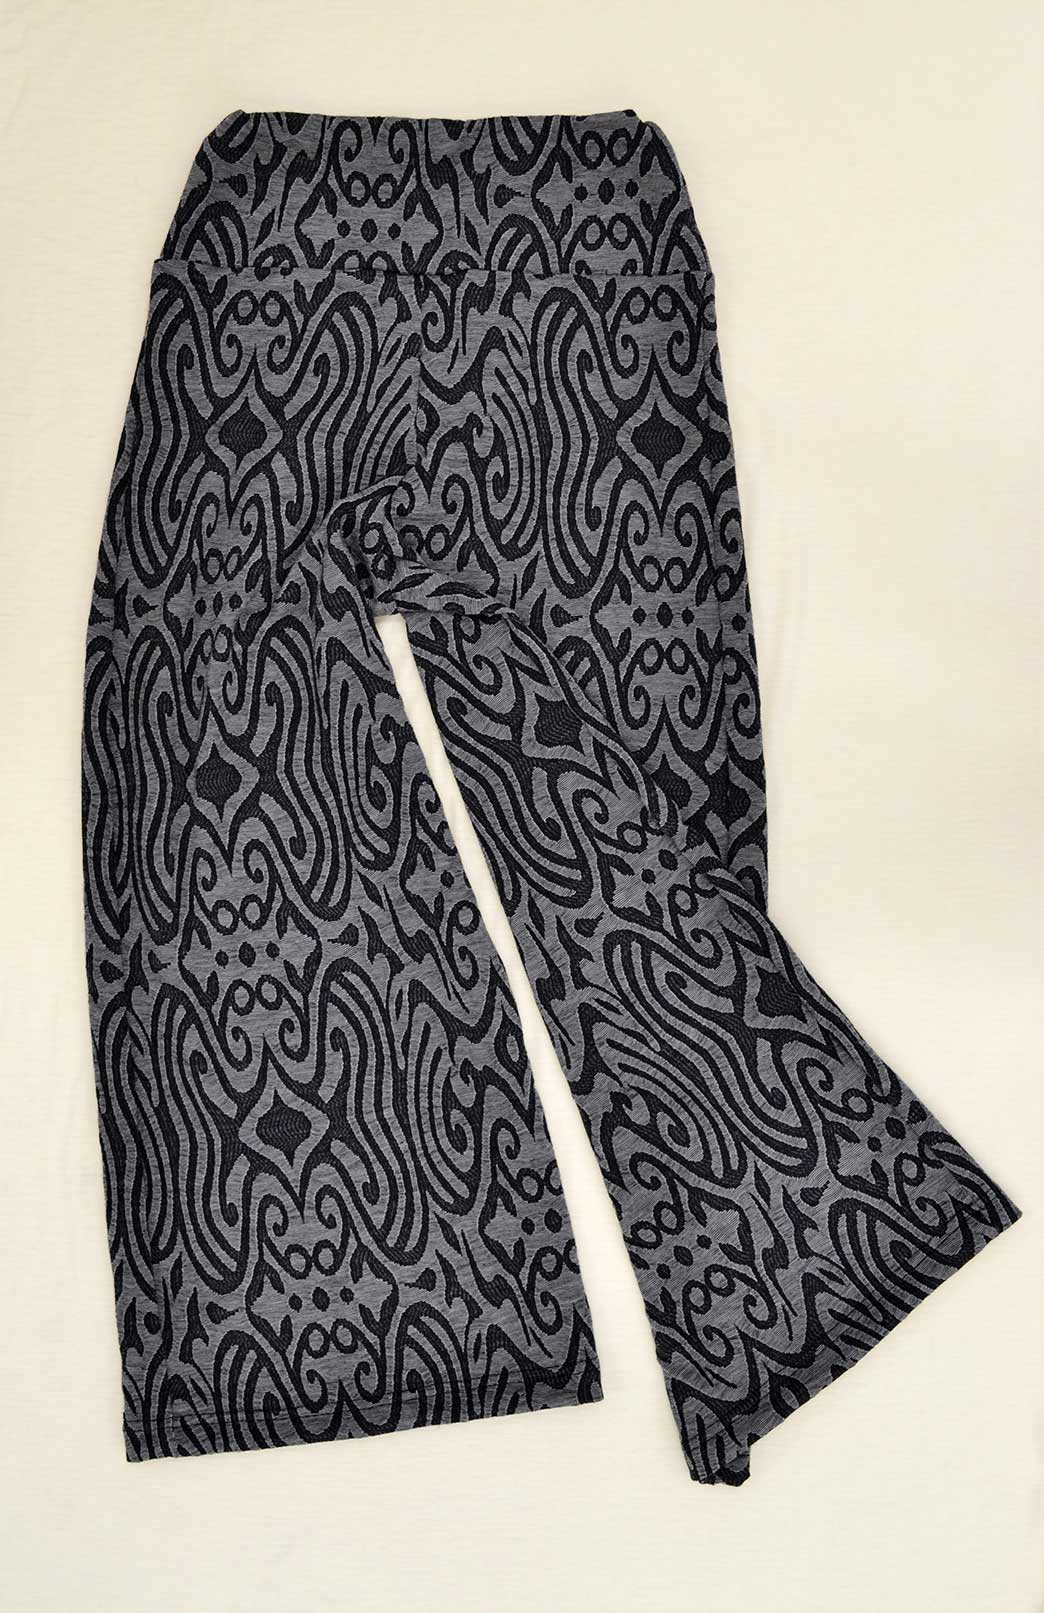 Wide Leg Crop Pant - Women's wool crop pants with wide legs and wide waistband - Smitten Merino Tasmania Australia